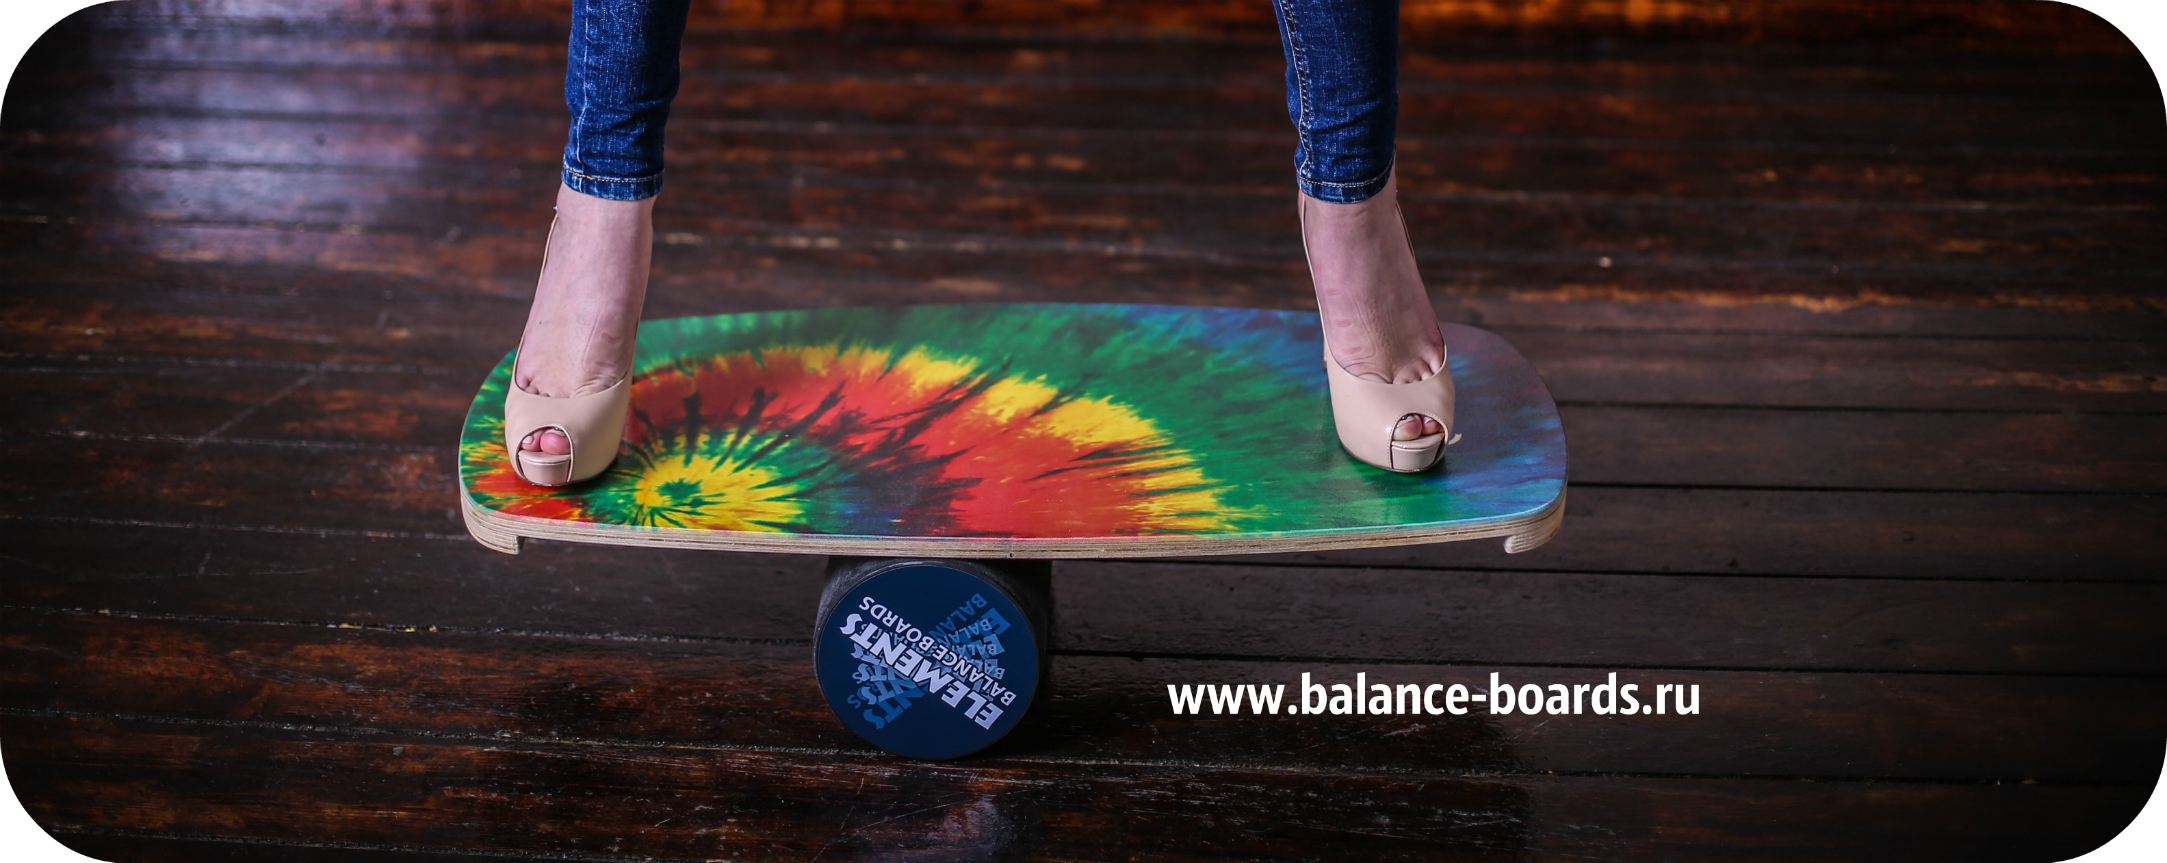 http://balance-boards.ru/images/upload/Тренажер%20для%20красивого%20животика.jpg